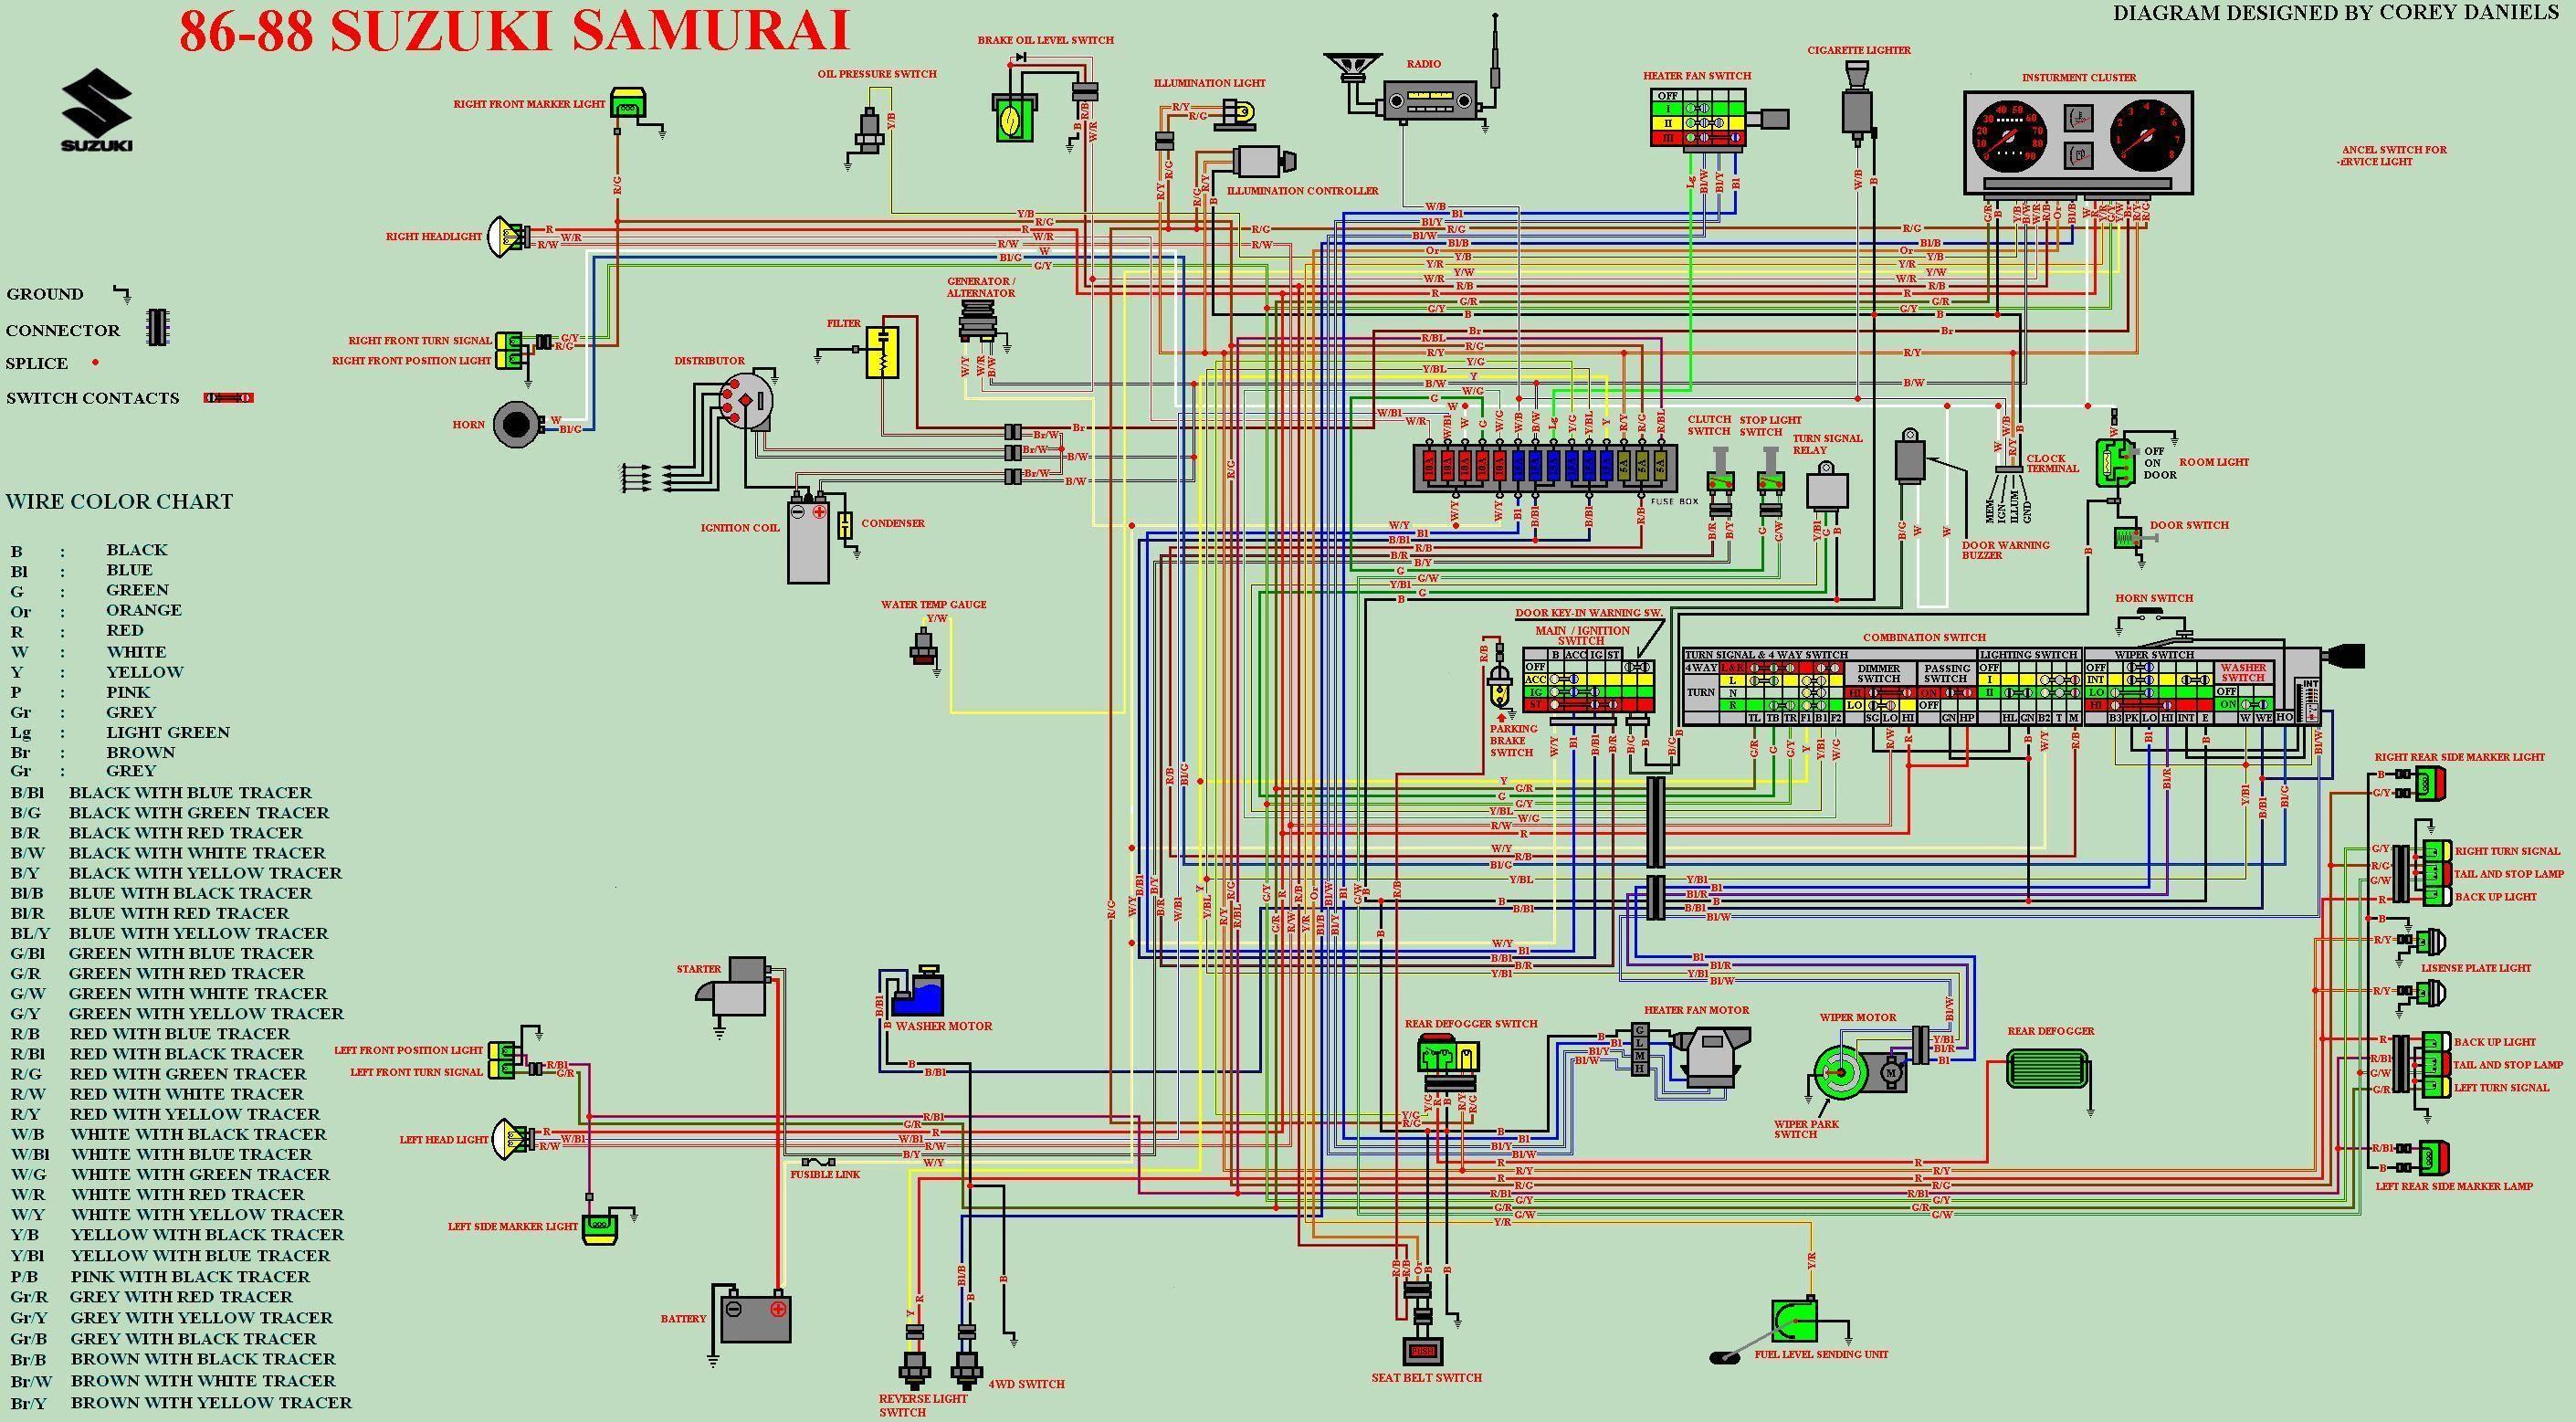 tb_1362] hitachi distributor wiring diagram download diagram  sheox xortanet trons mohammedshrine librar wiring 101